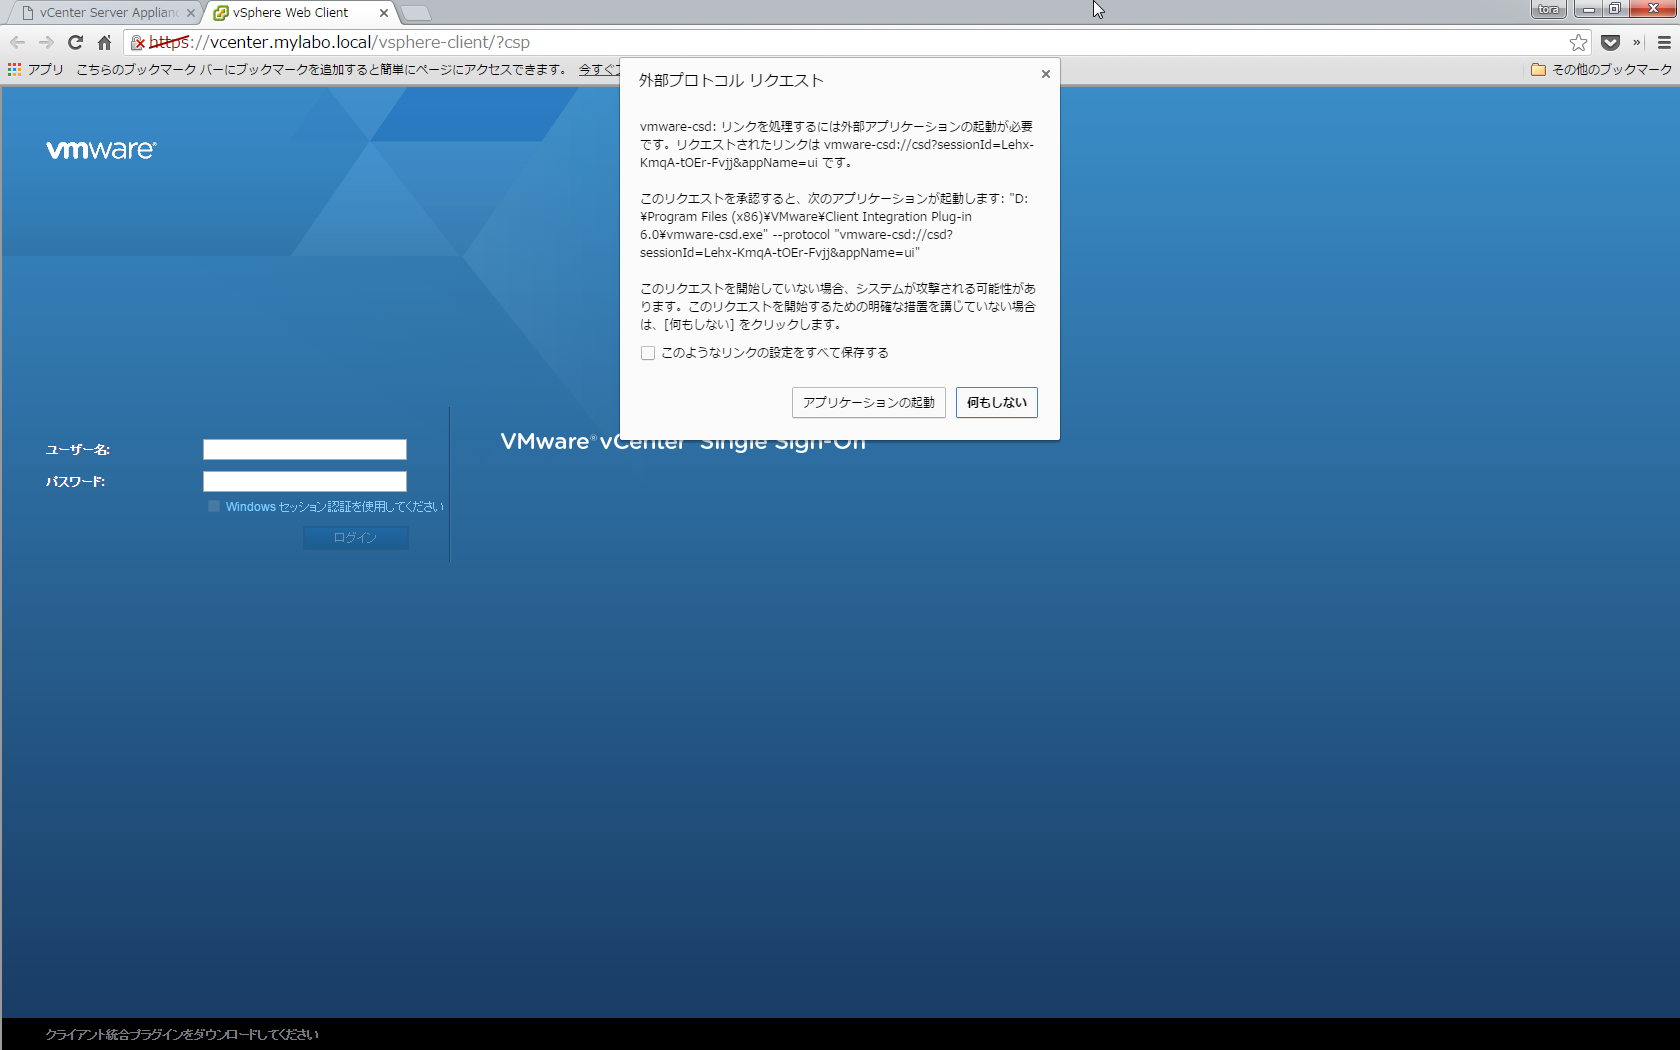 download vmware client integration plugin 6.0.0